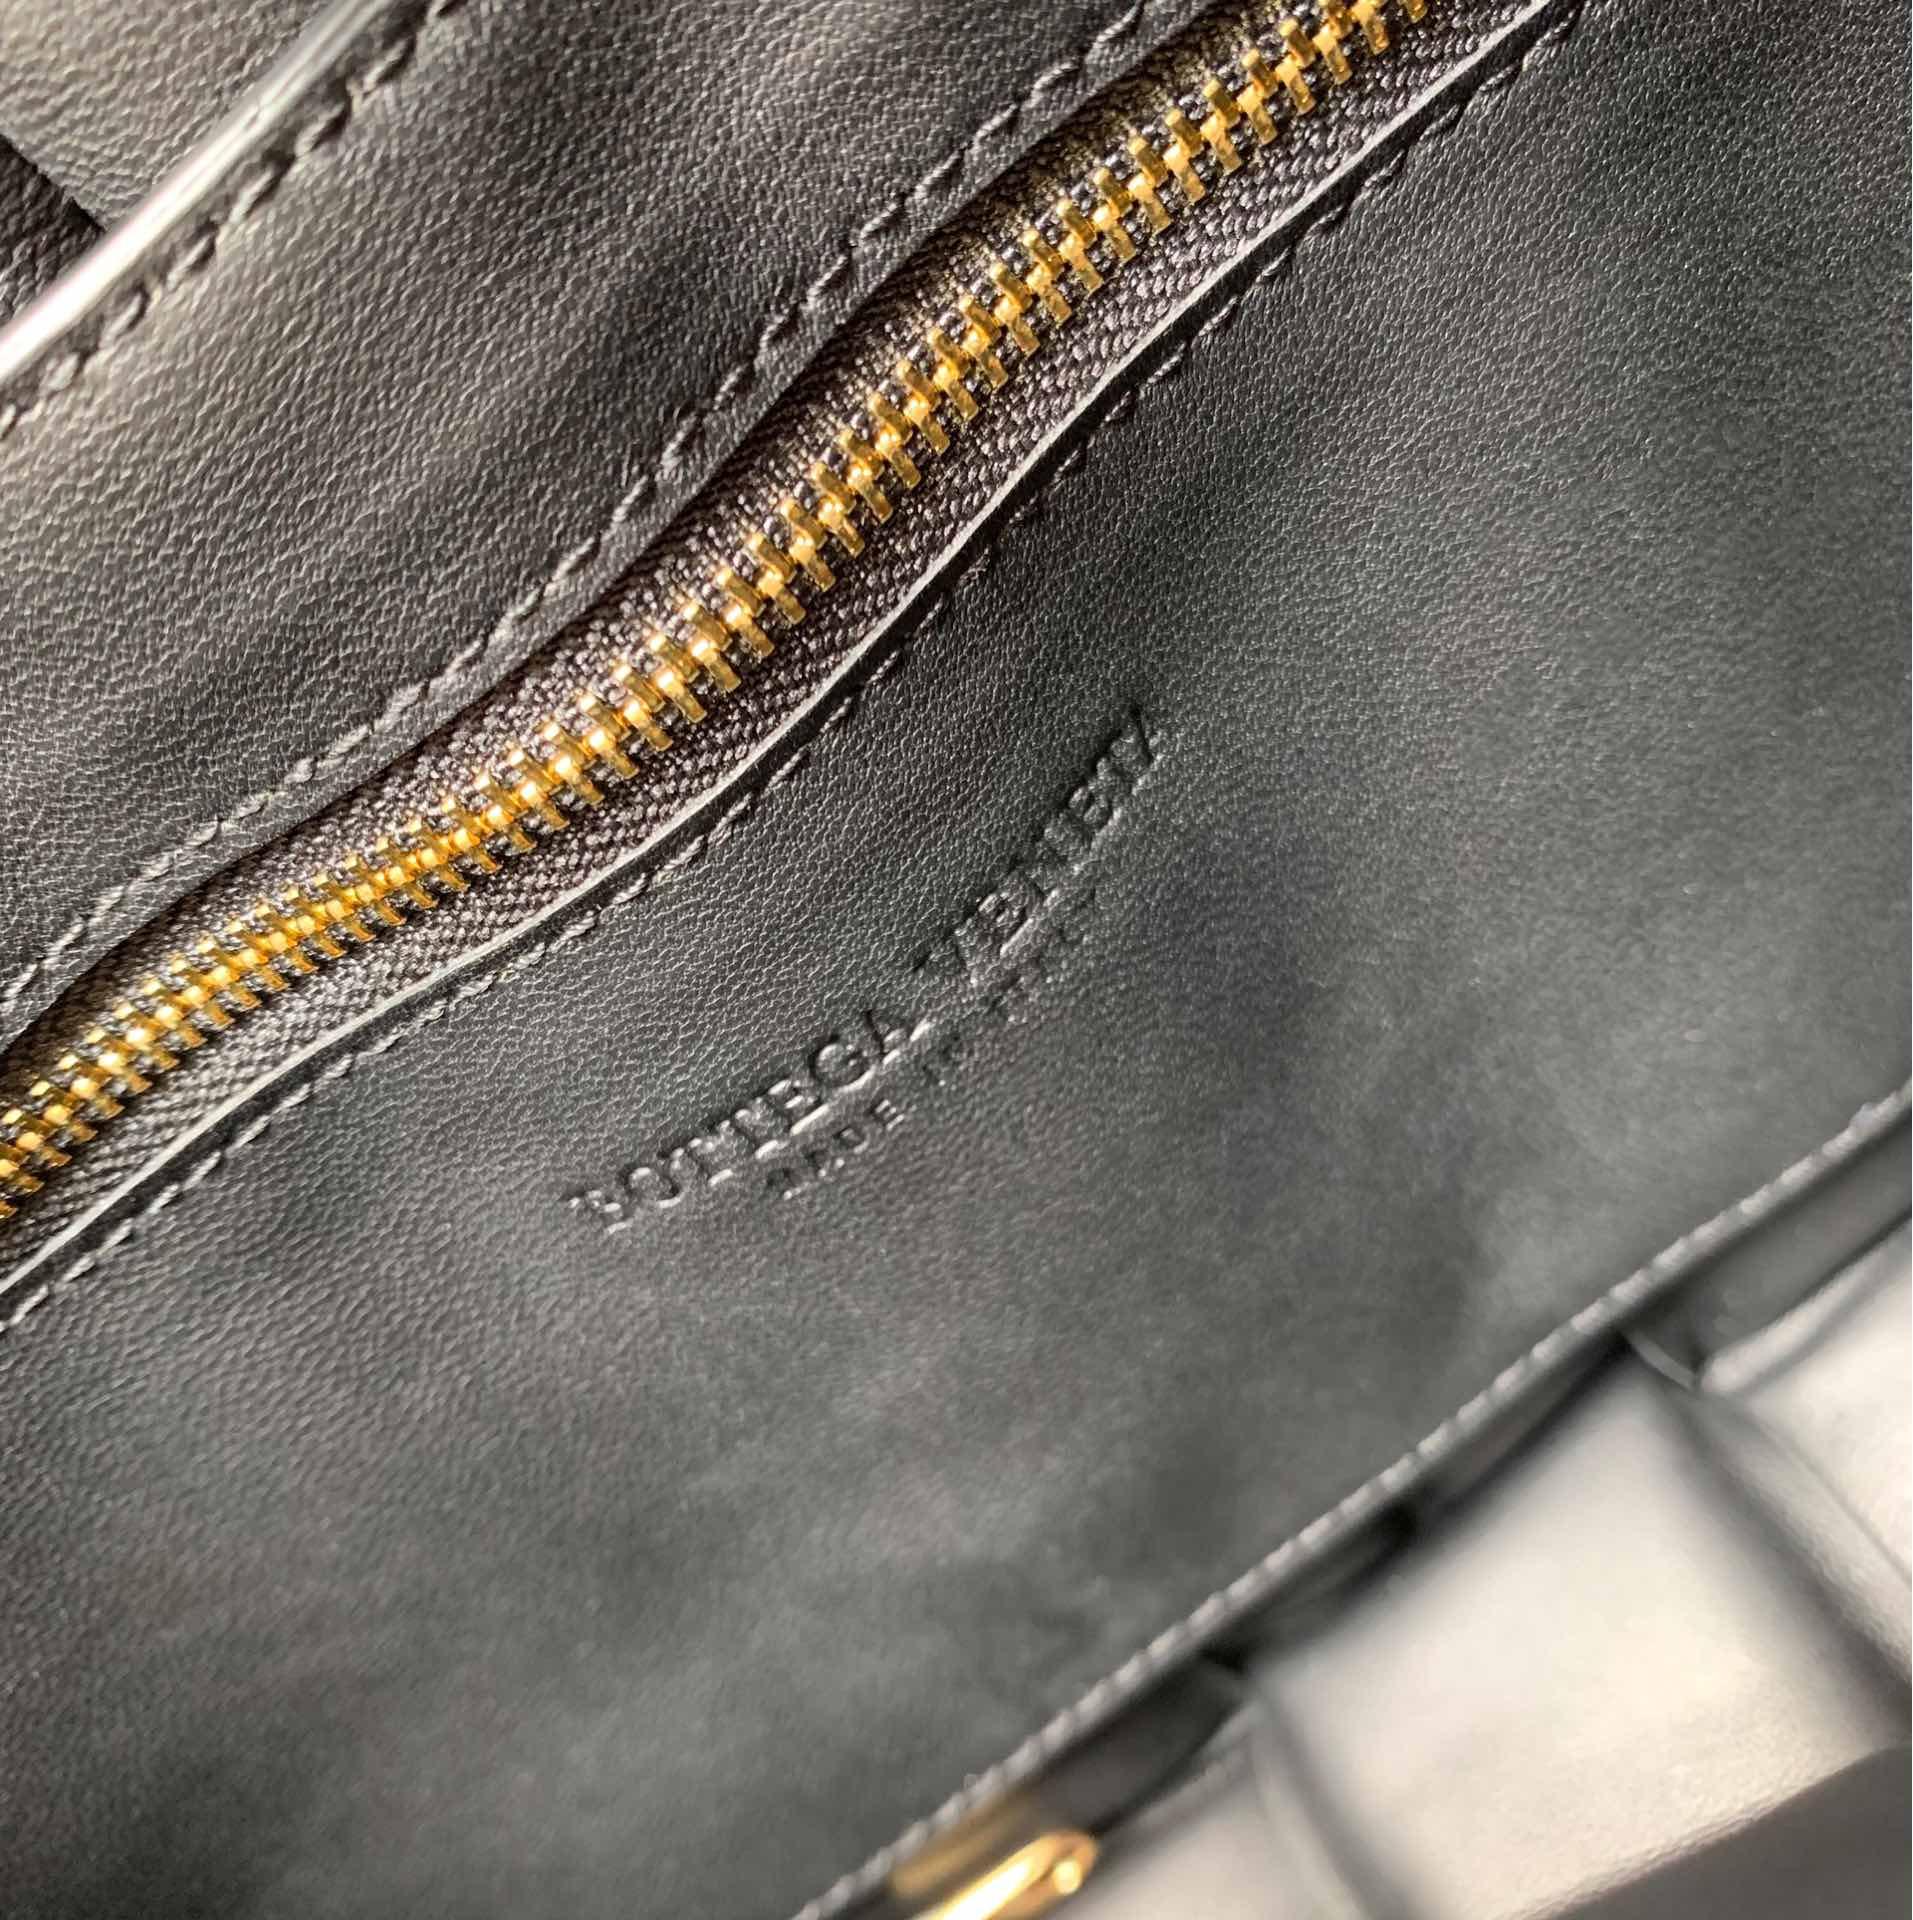 【P1920】Bv秋冬新品 枕头包 外进口牛皮内里小羊皮 黑色 591970 26-18-8